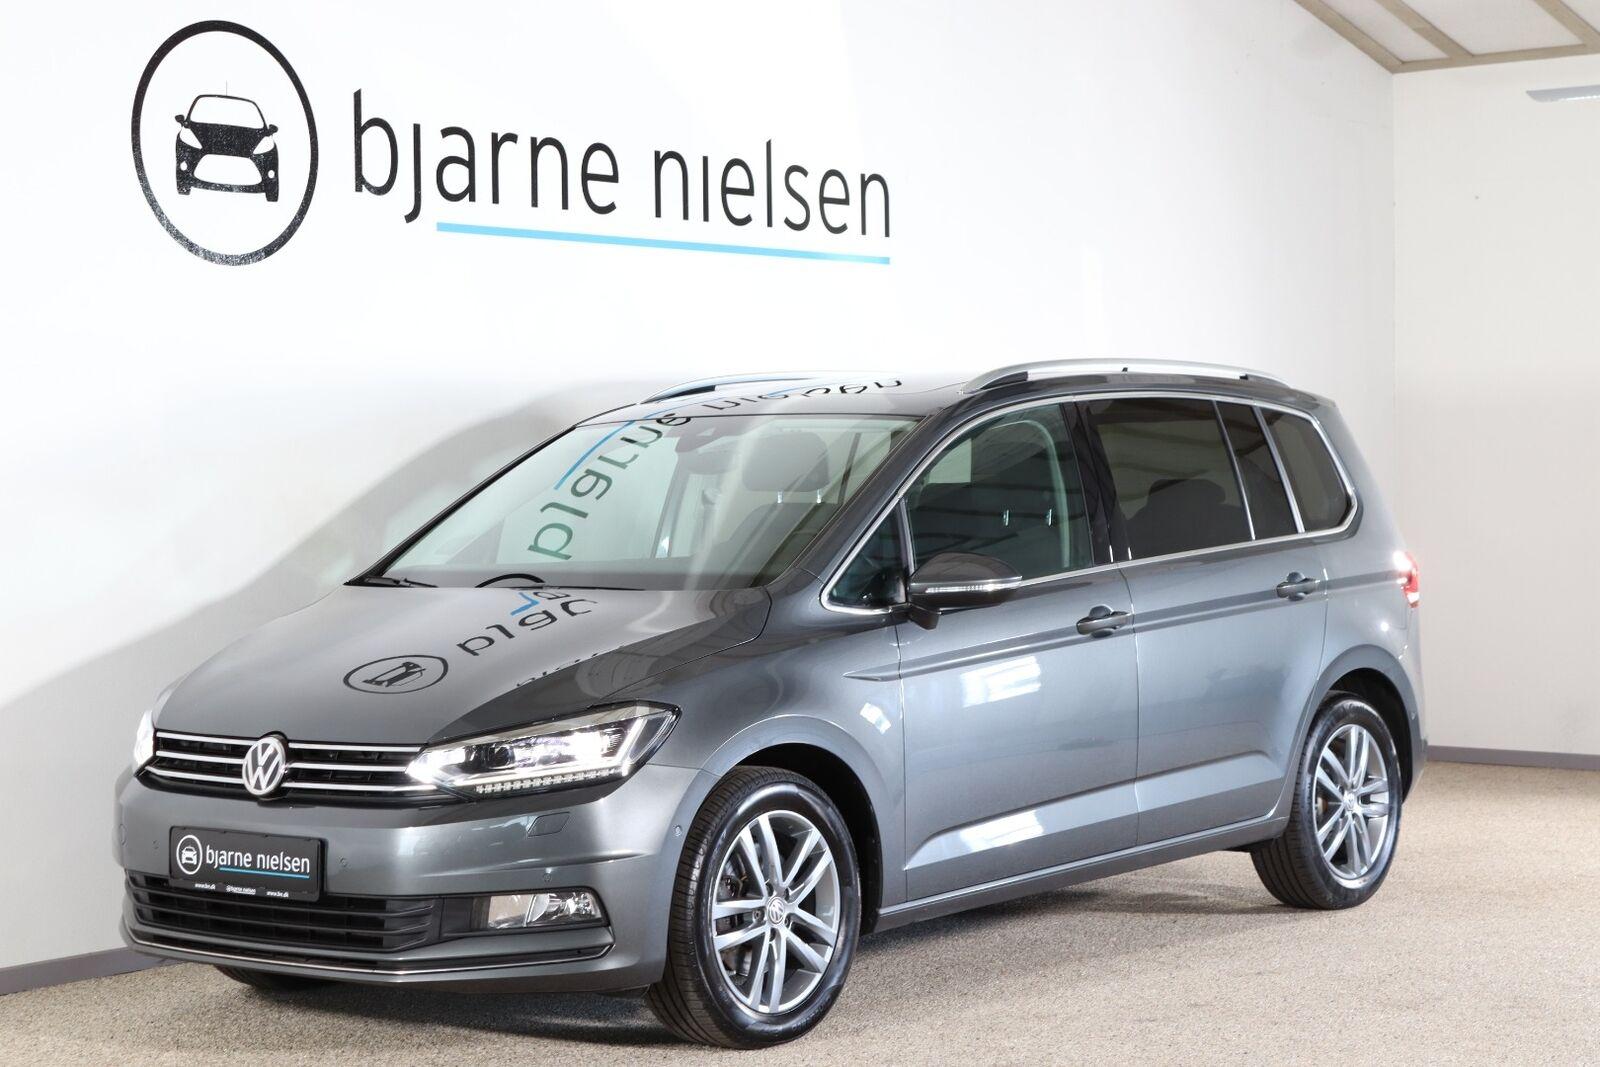 VW Touran 2,0 TDi 190 Highline DSG